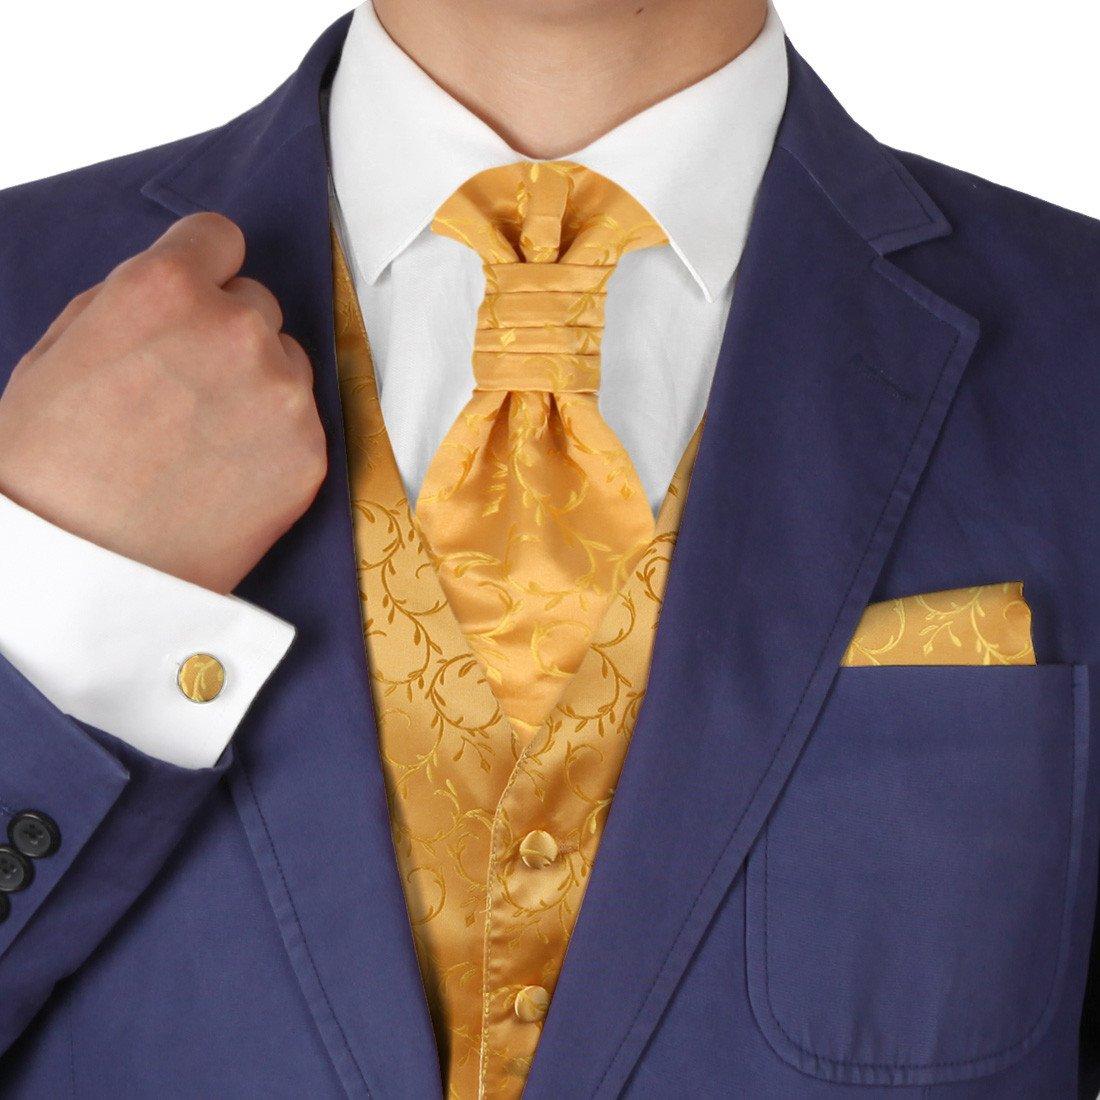 Y/&G Mens Fashion Multi Patterned Good Mens Vests Cufflinks Hanky Ascot Tie Set YGB1B01